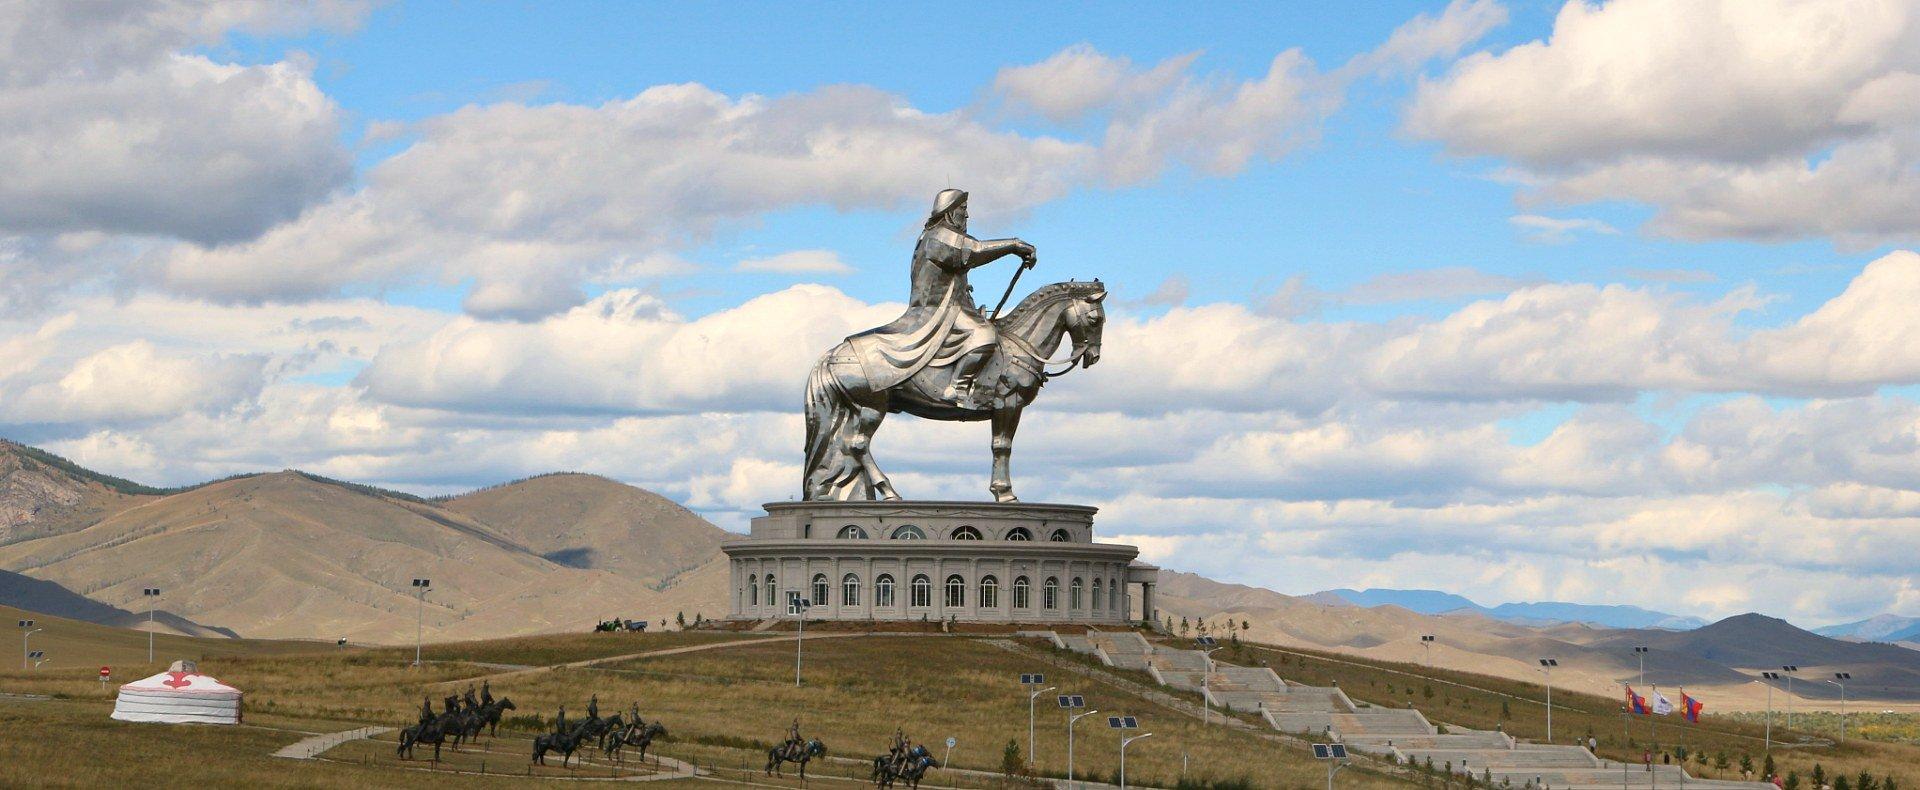 Ulan Bator, Mongolia Gallery